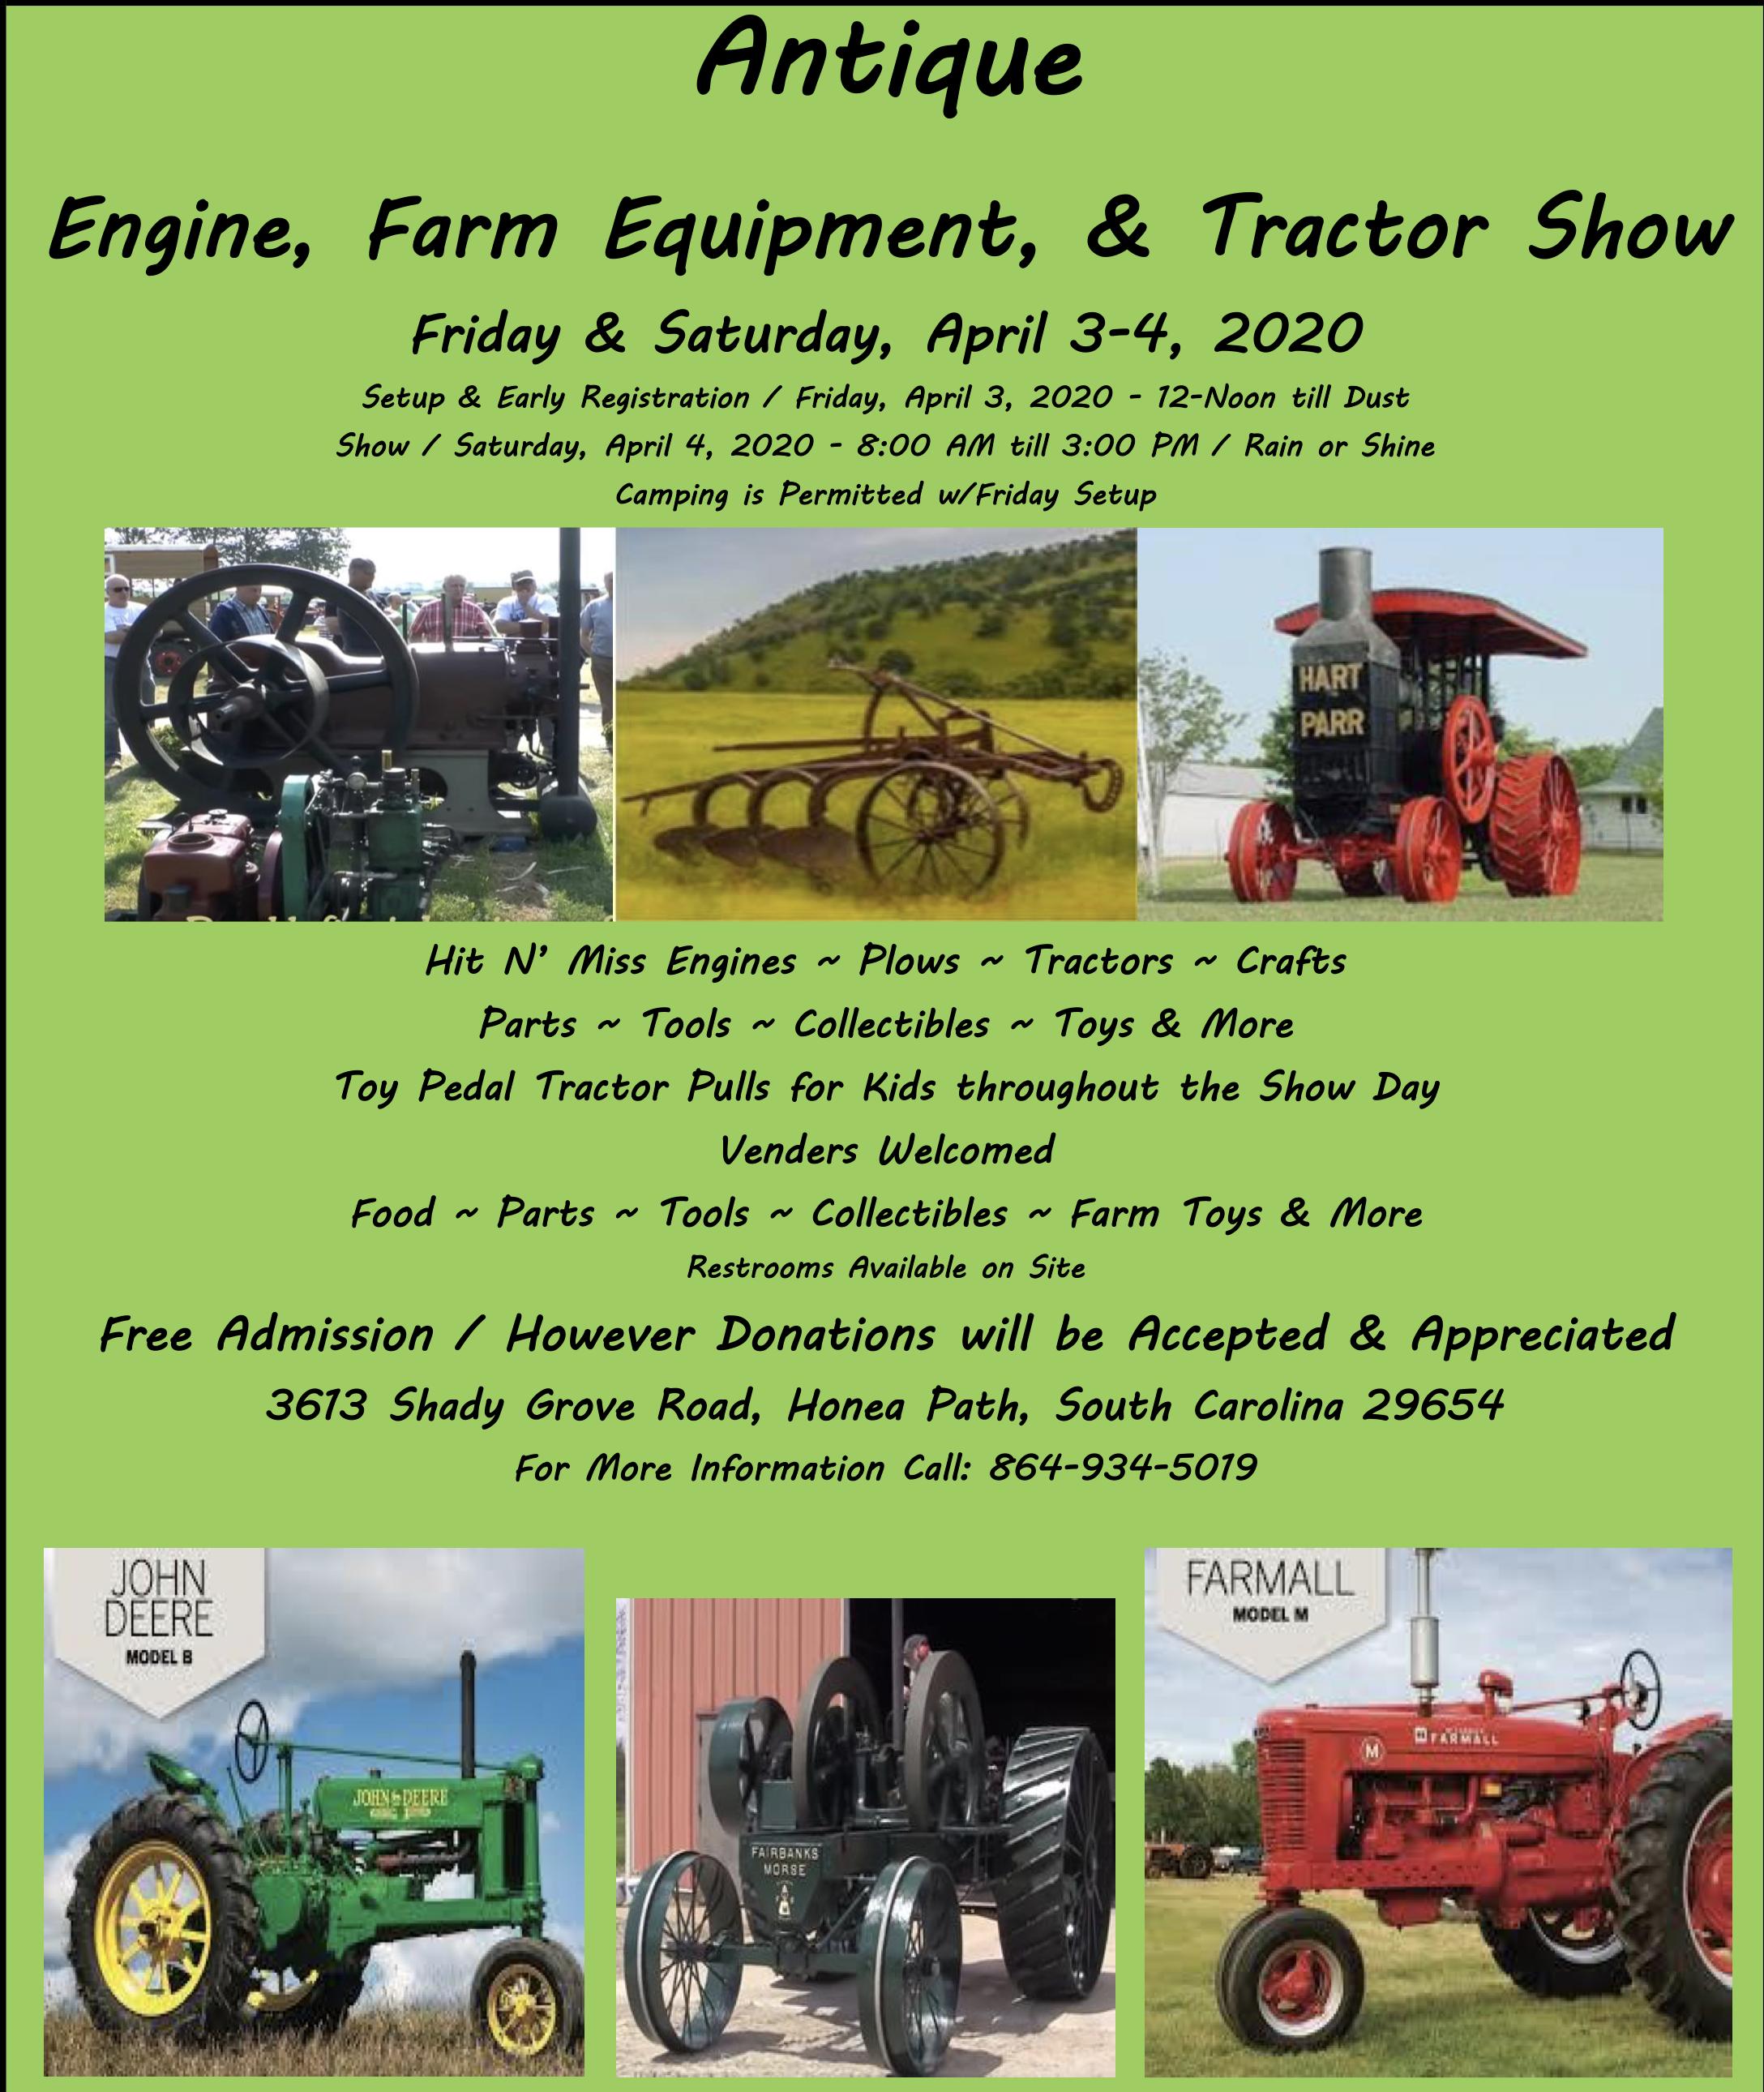 Tractor Shows Calendar - Antique Tractor Blog